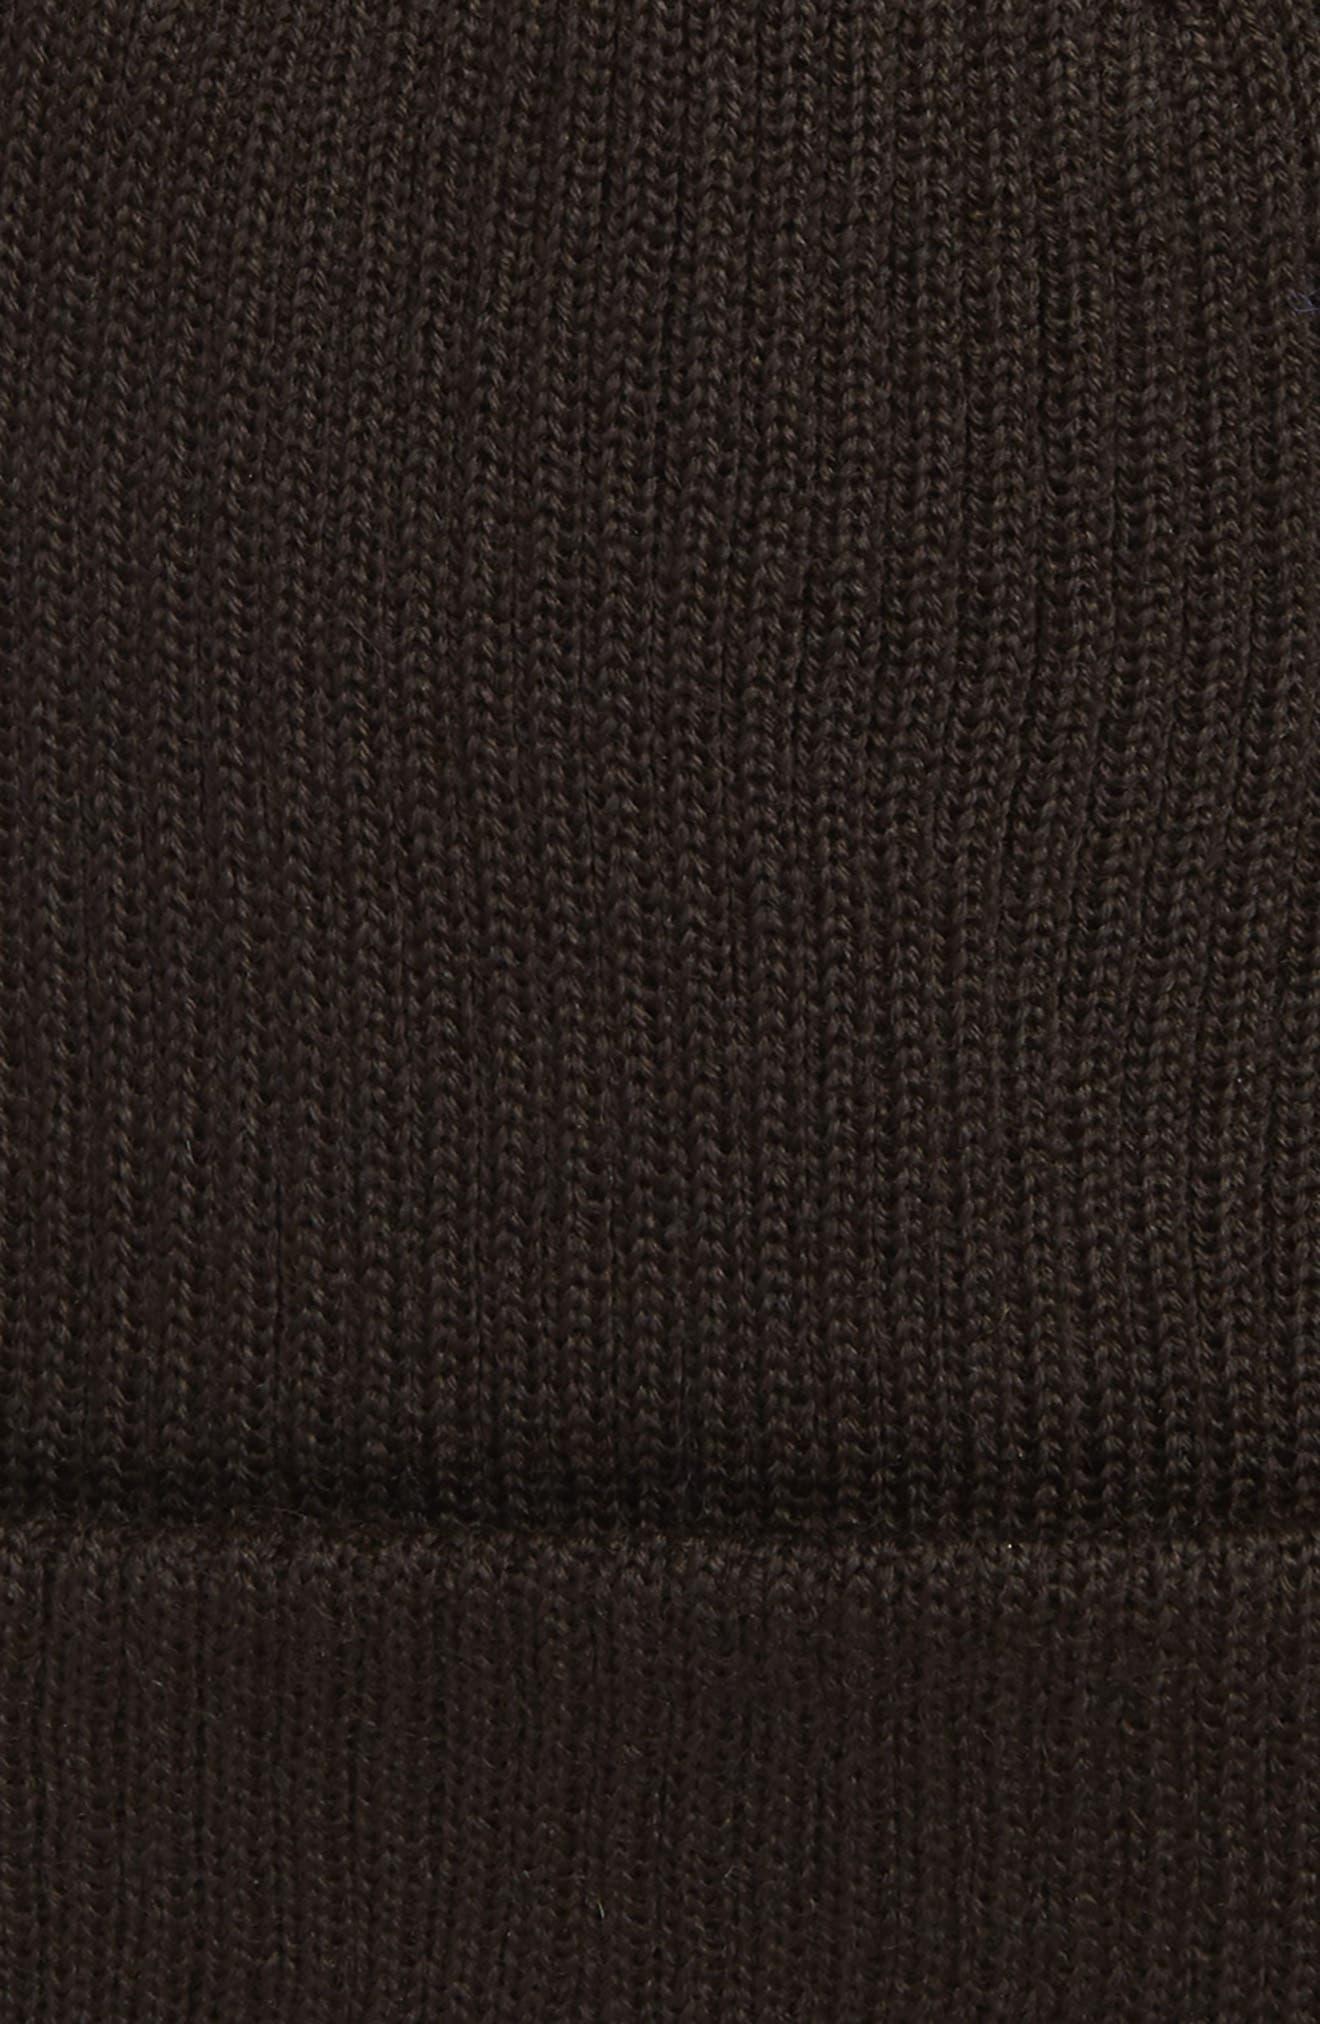 NIKE,                             NikeLab Essential Knit Beanie,                             Alternate thumbnail 2, color,                             010